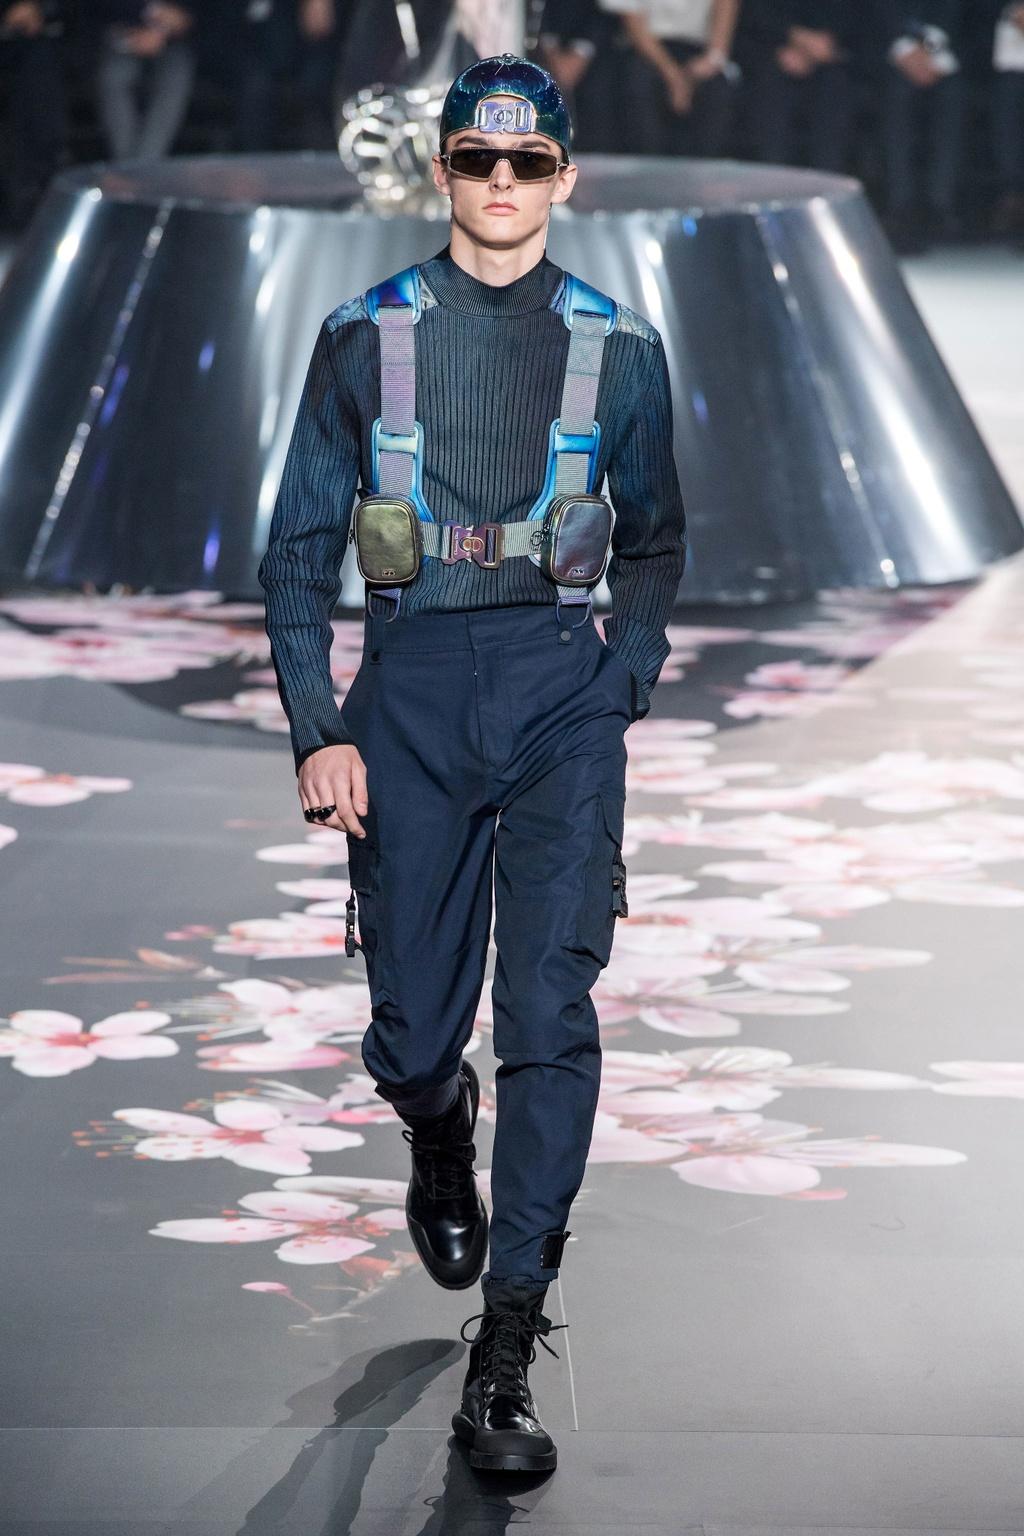 Show dien Dior gay sot voi phu kien giong bao dung sung hinh anh 10